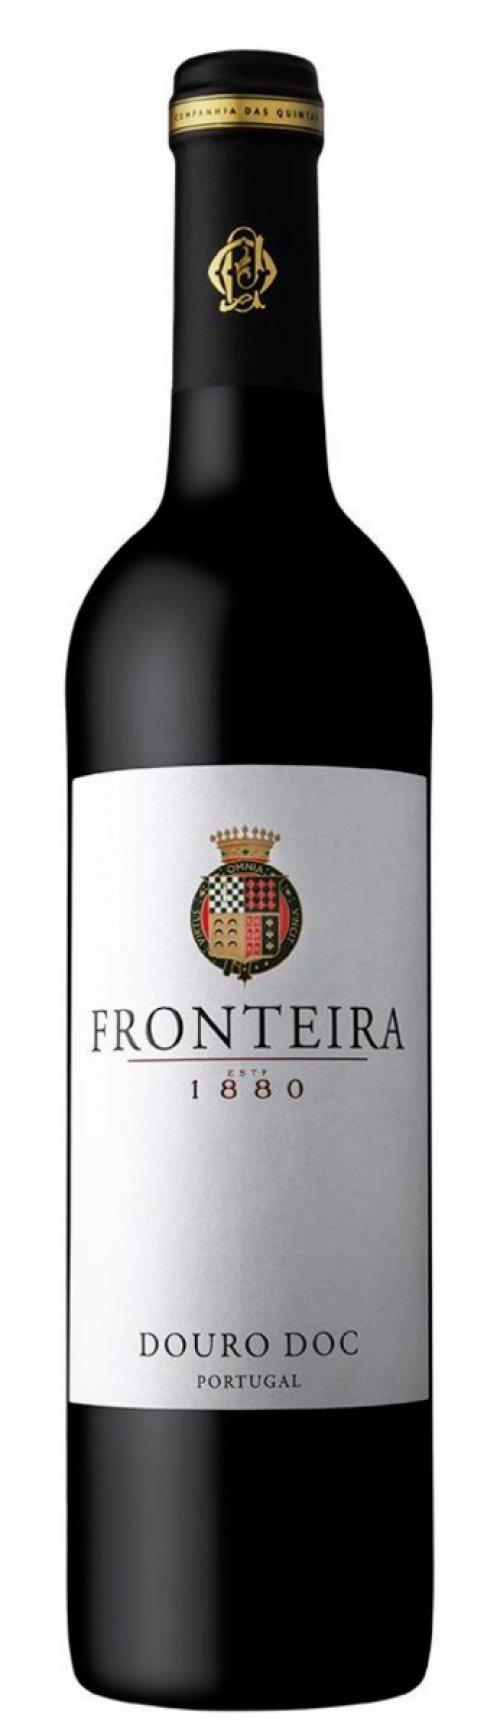 Fronteira   2013